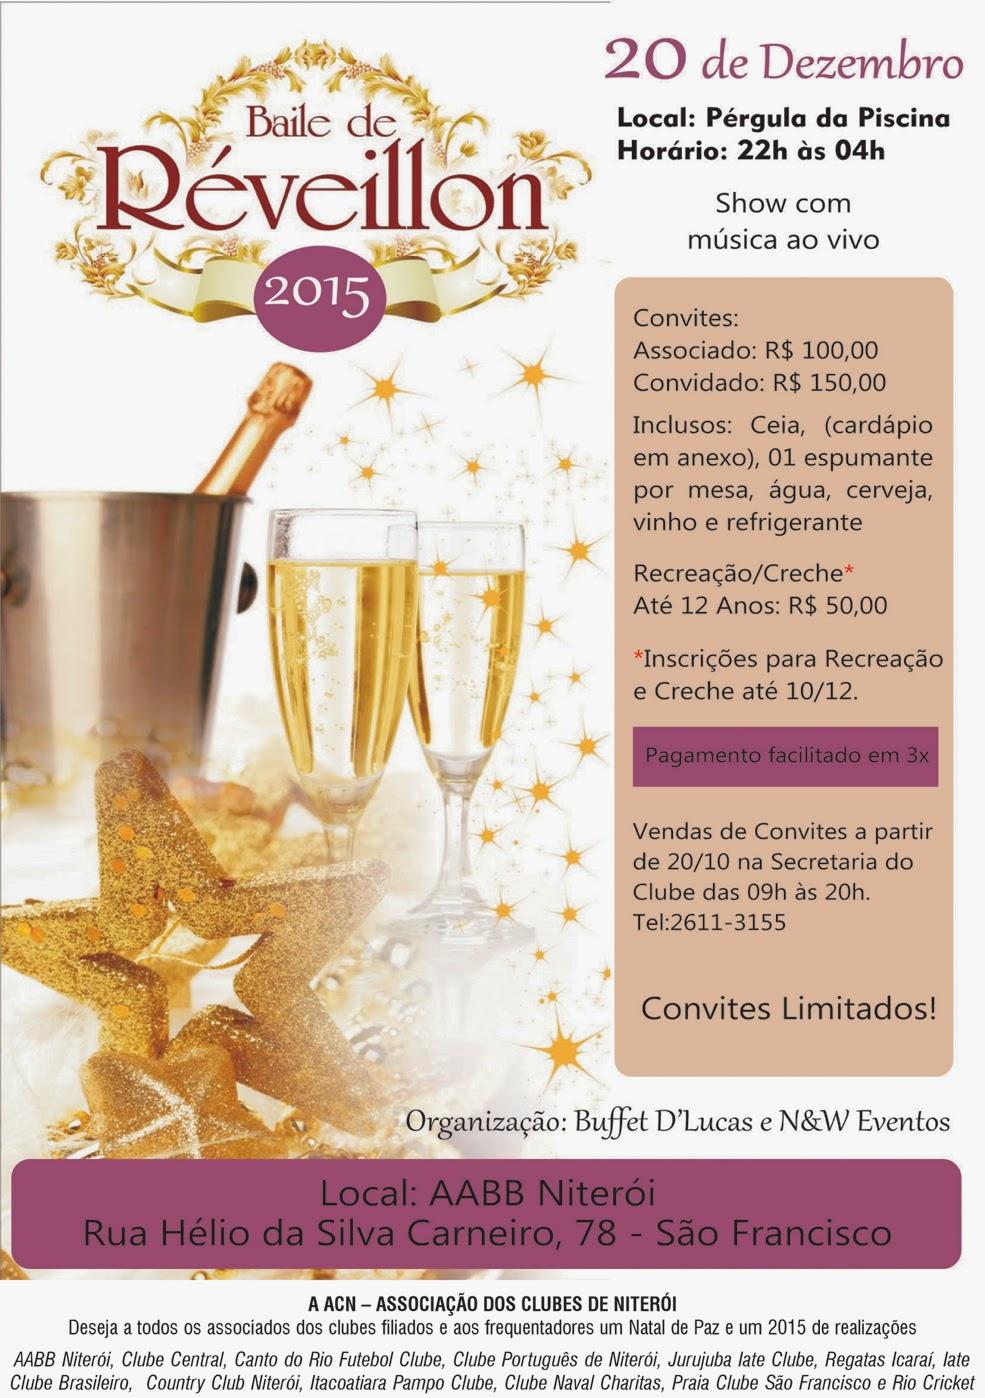 ACN promove baile de pré-reveillon na AABB Niterói